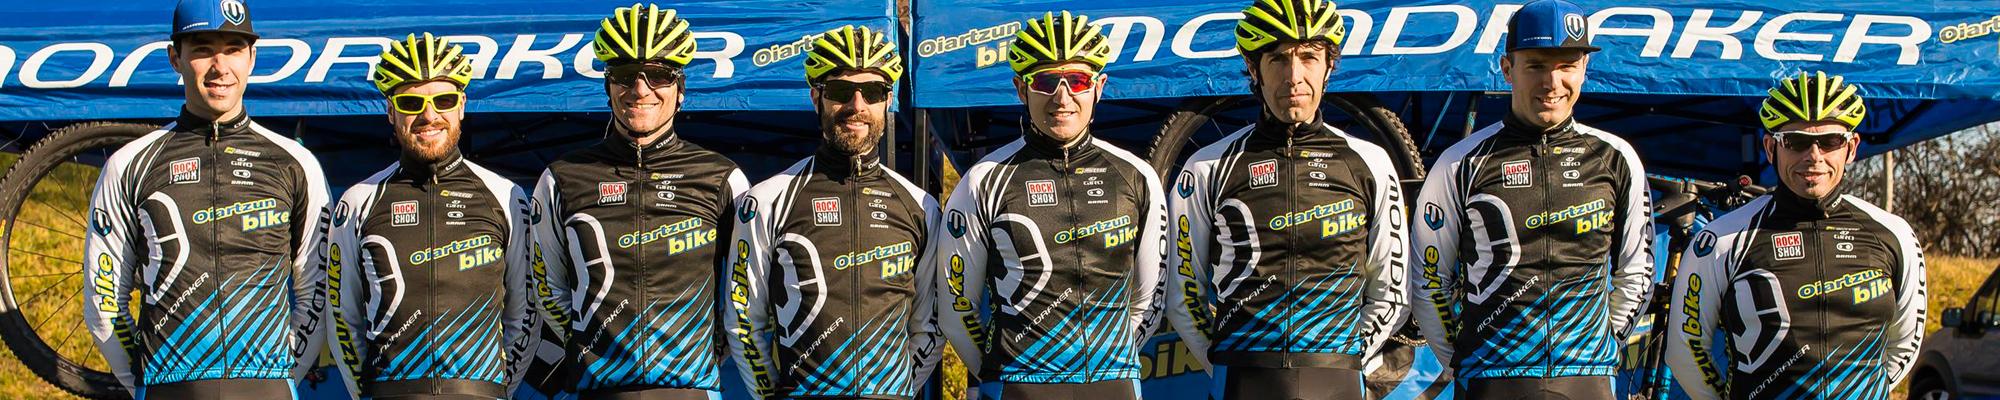 Oiartzun Bike Team